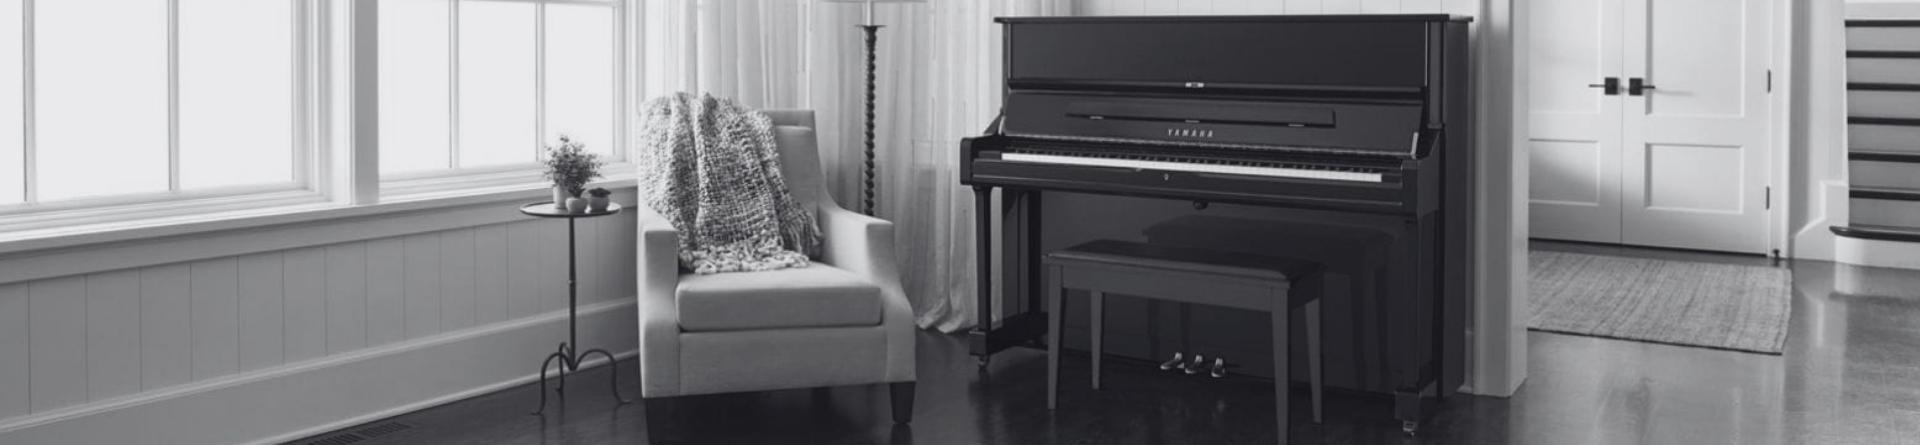 FEATURED PIANO — YAMAHA U1 SH2